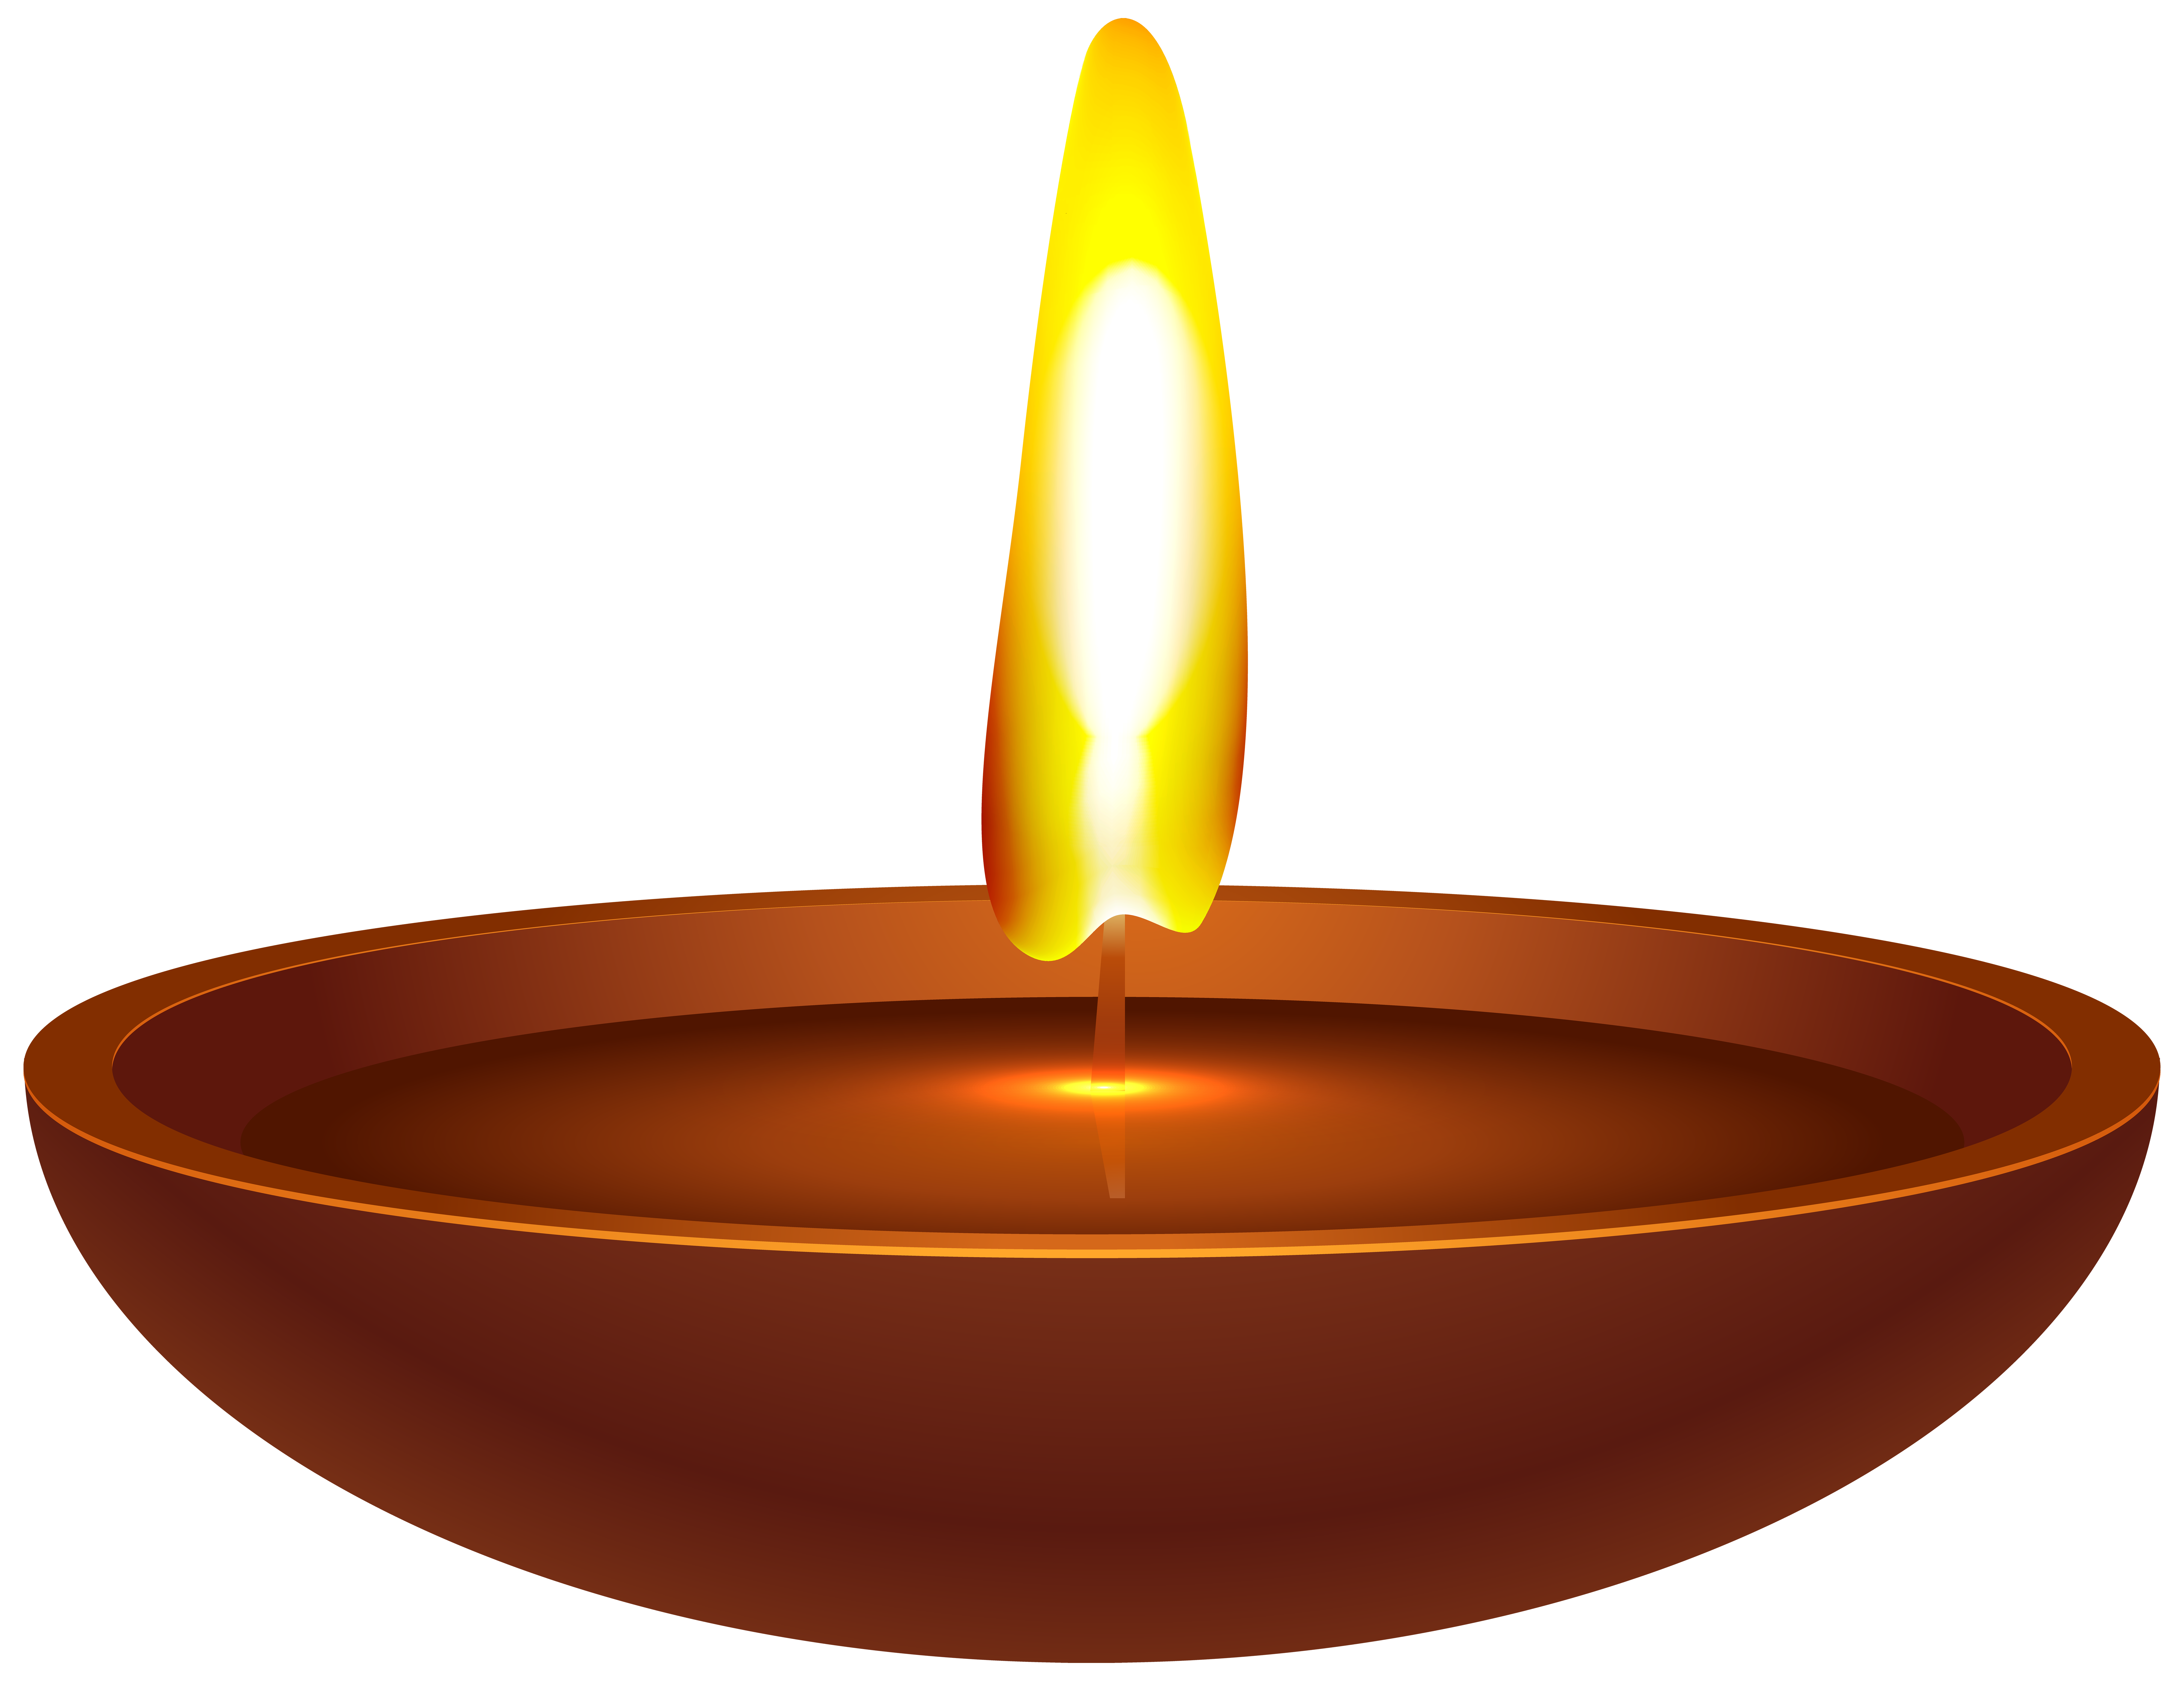 Wax india candle transparent. Oil clipart flour